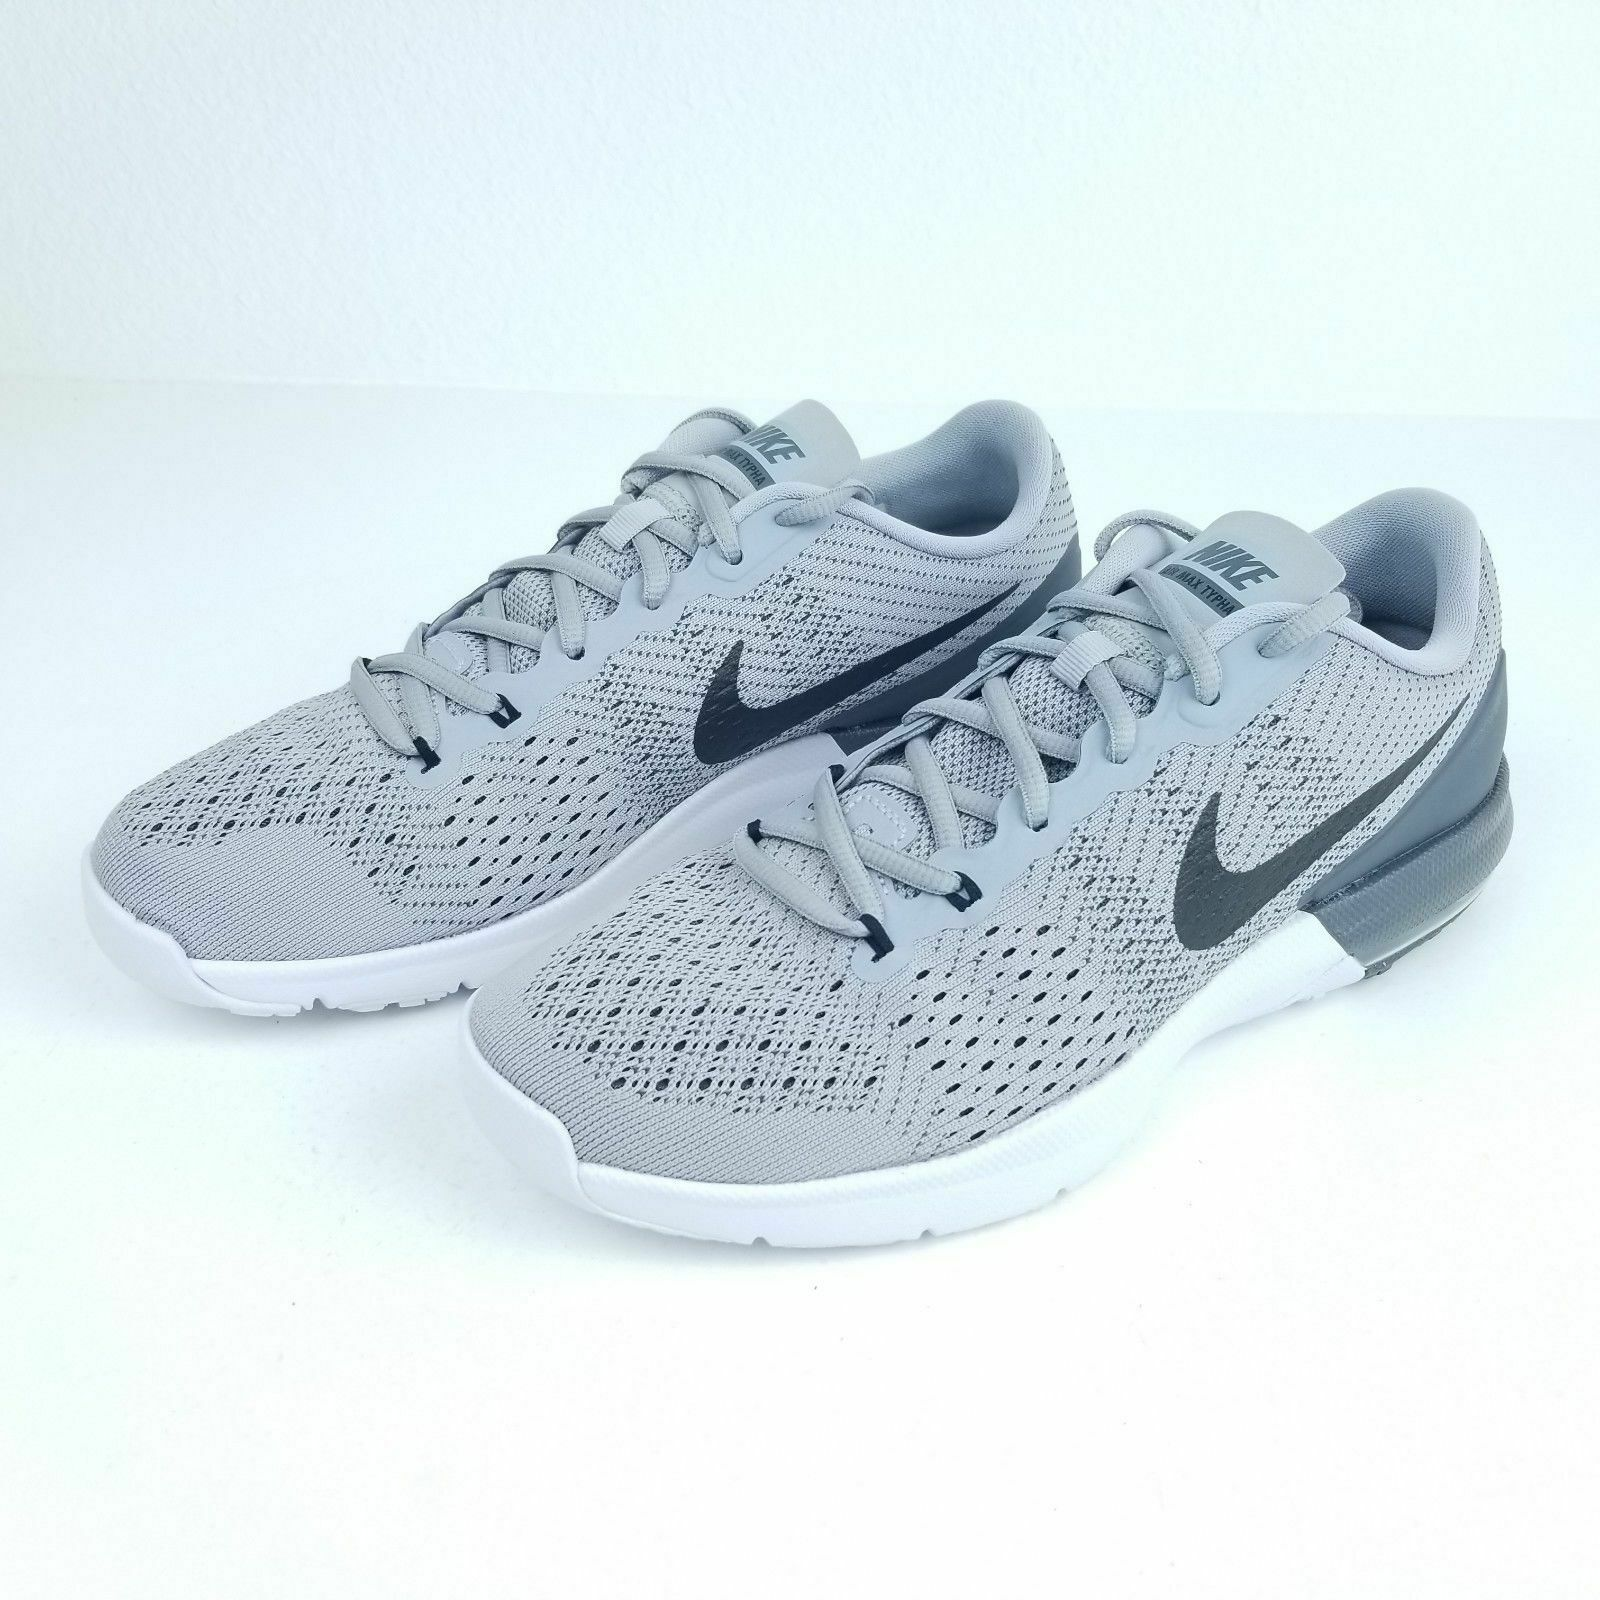 Men's Nike AIR MAX TYPHA TRAINING SHOE WOLF GREY 820198 002 Size 15